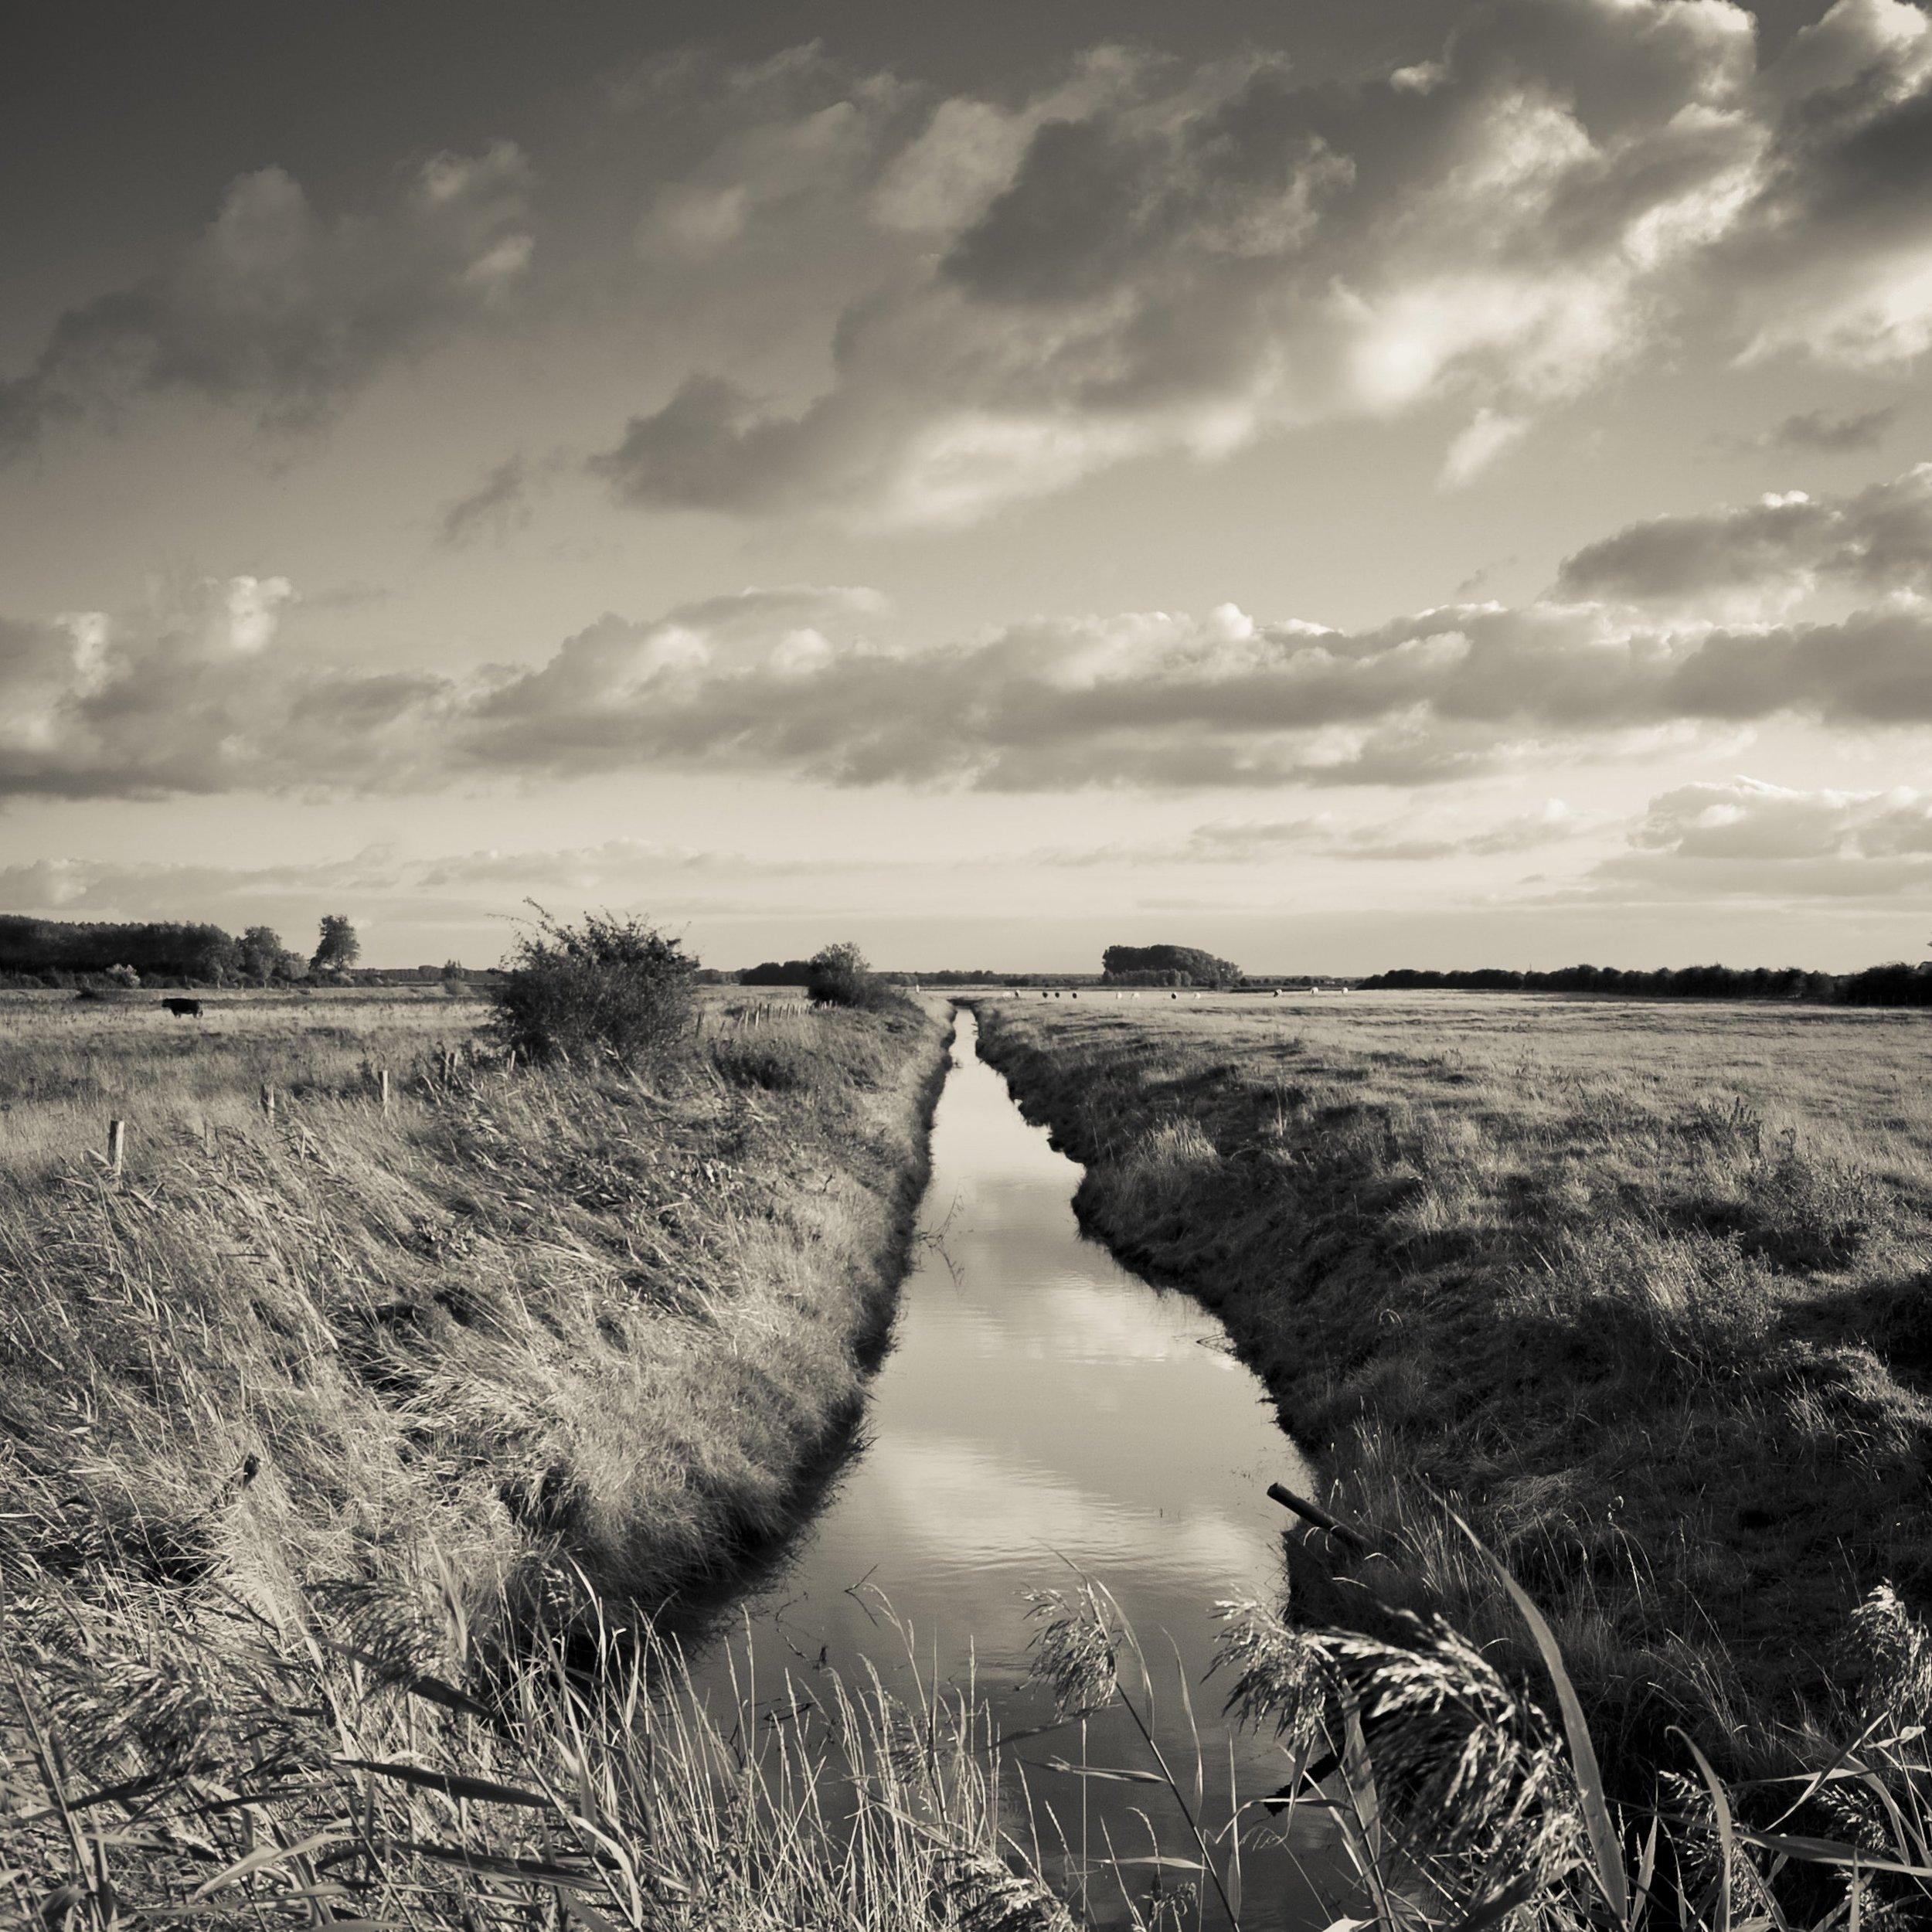 Path/Stream to field